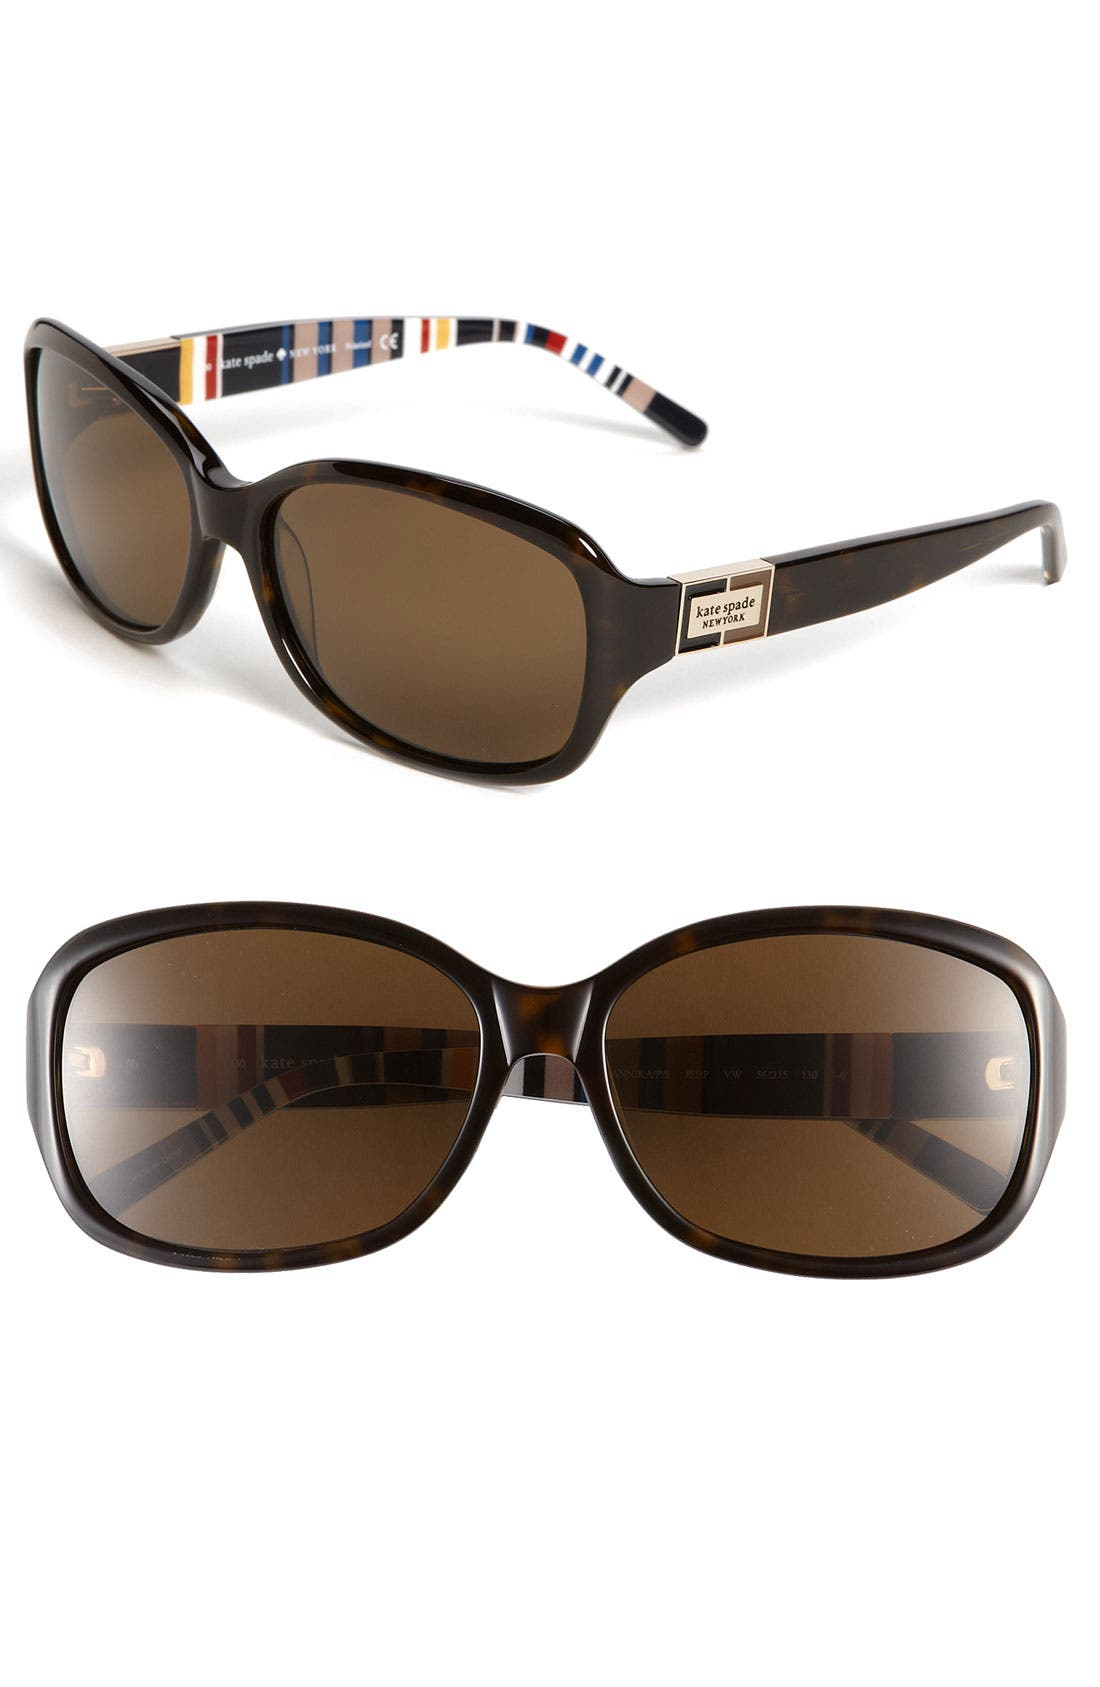 Alternate Image 1 Selected - kate spade new york annika/p/s 56mm polarized sunglasses